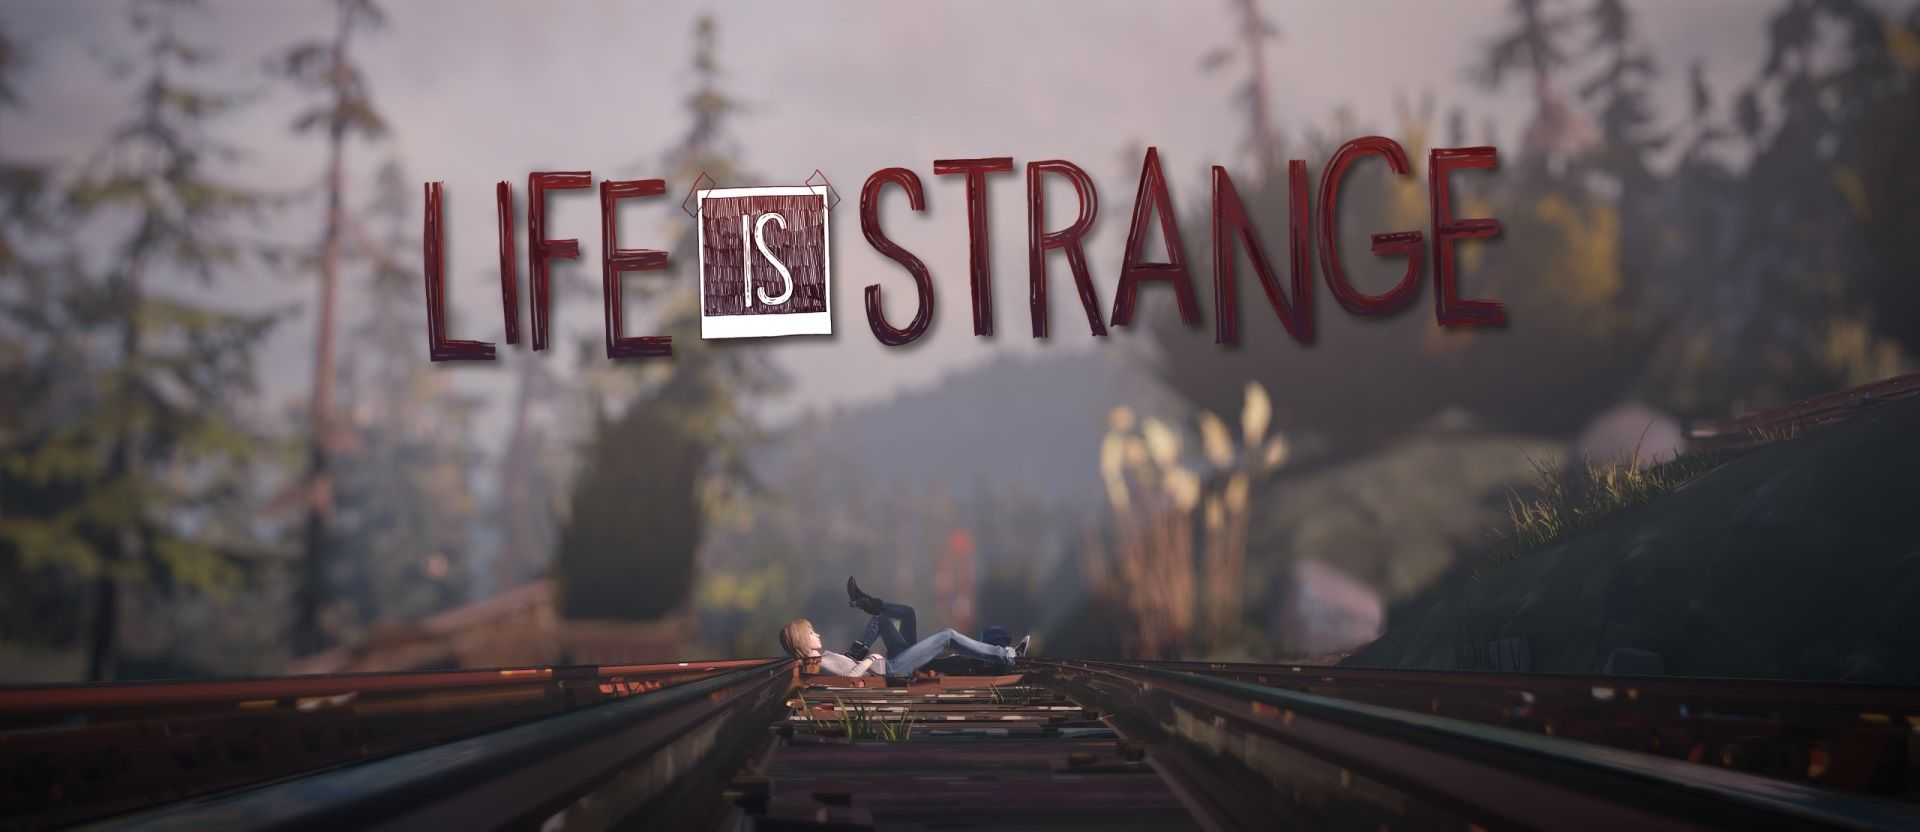 1920x832 Life Is Strange Hd Wallpaper Background Life Is Strange Strange Life Is Strange Wallpaper